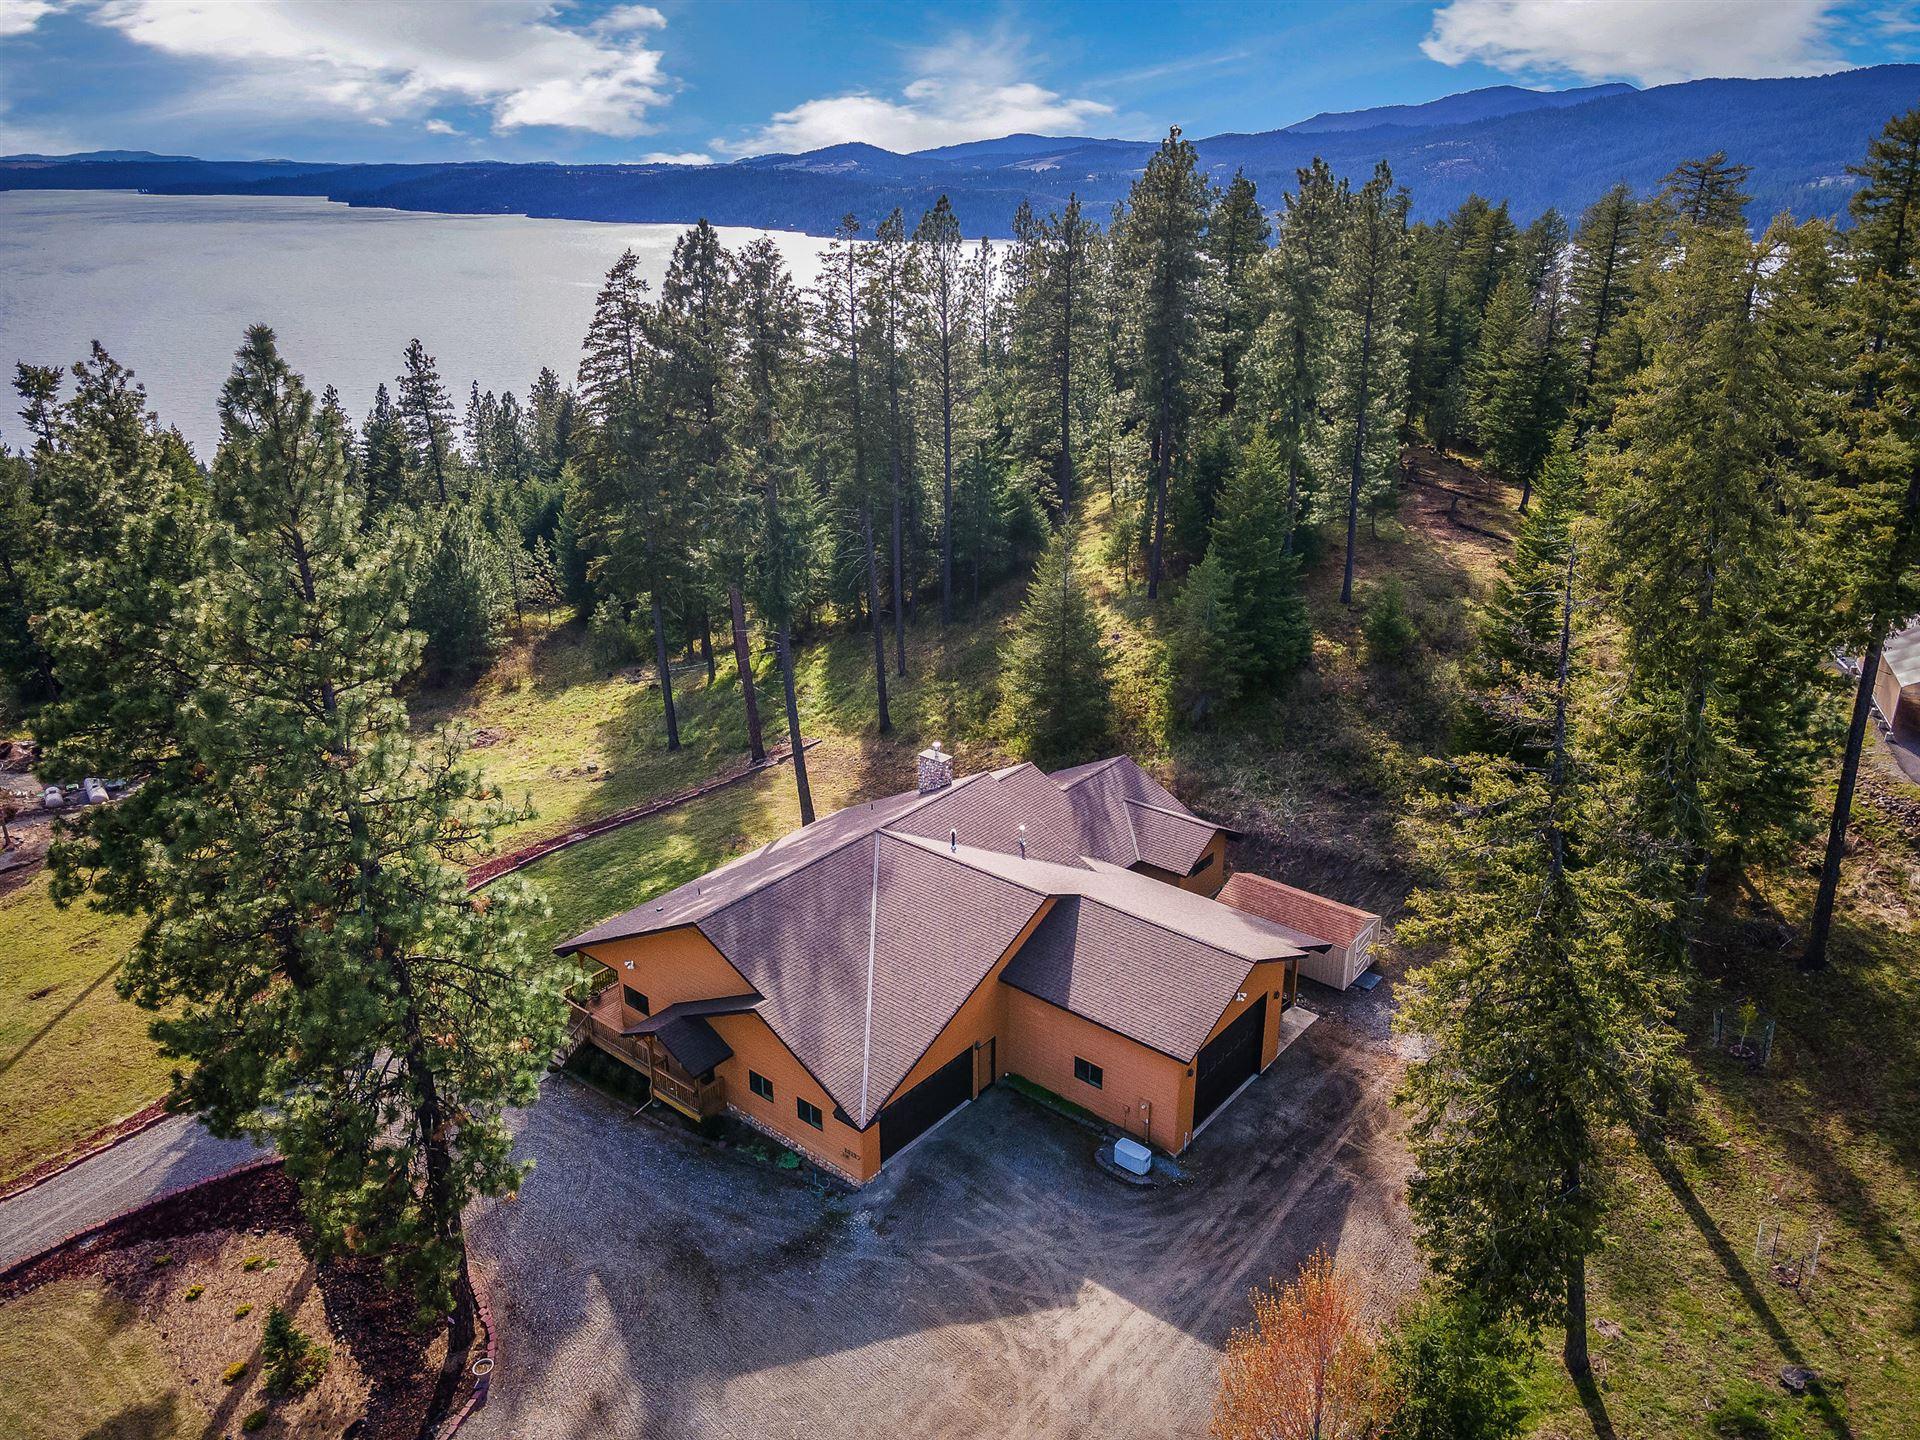 Photo of 13127 S Ridge View Lp, Harrison, ID 83833 (MLS # 21-3999)